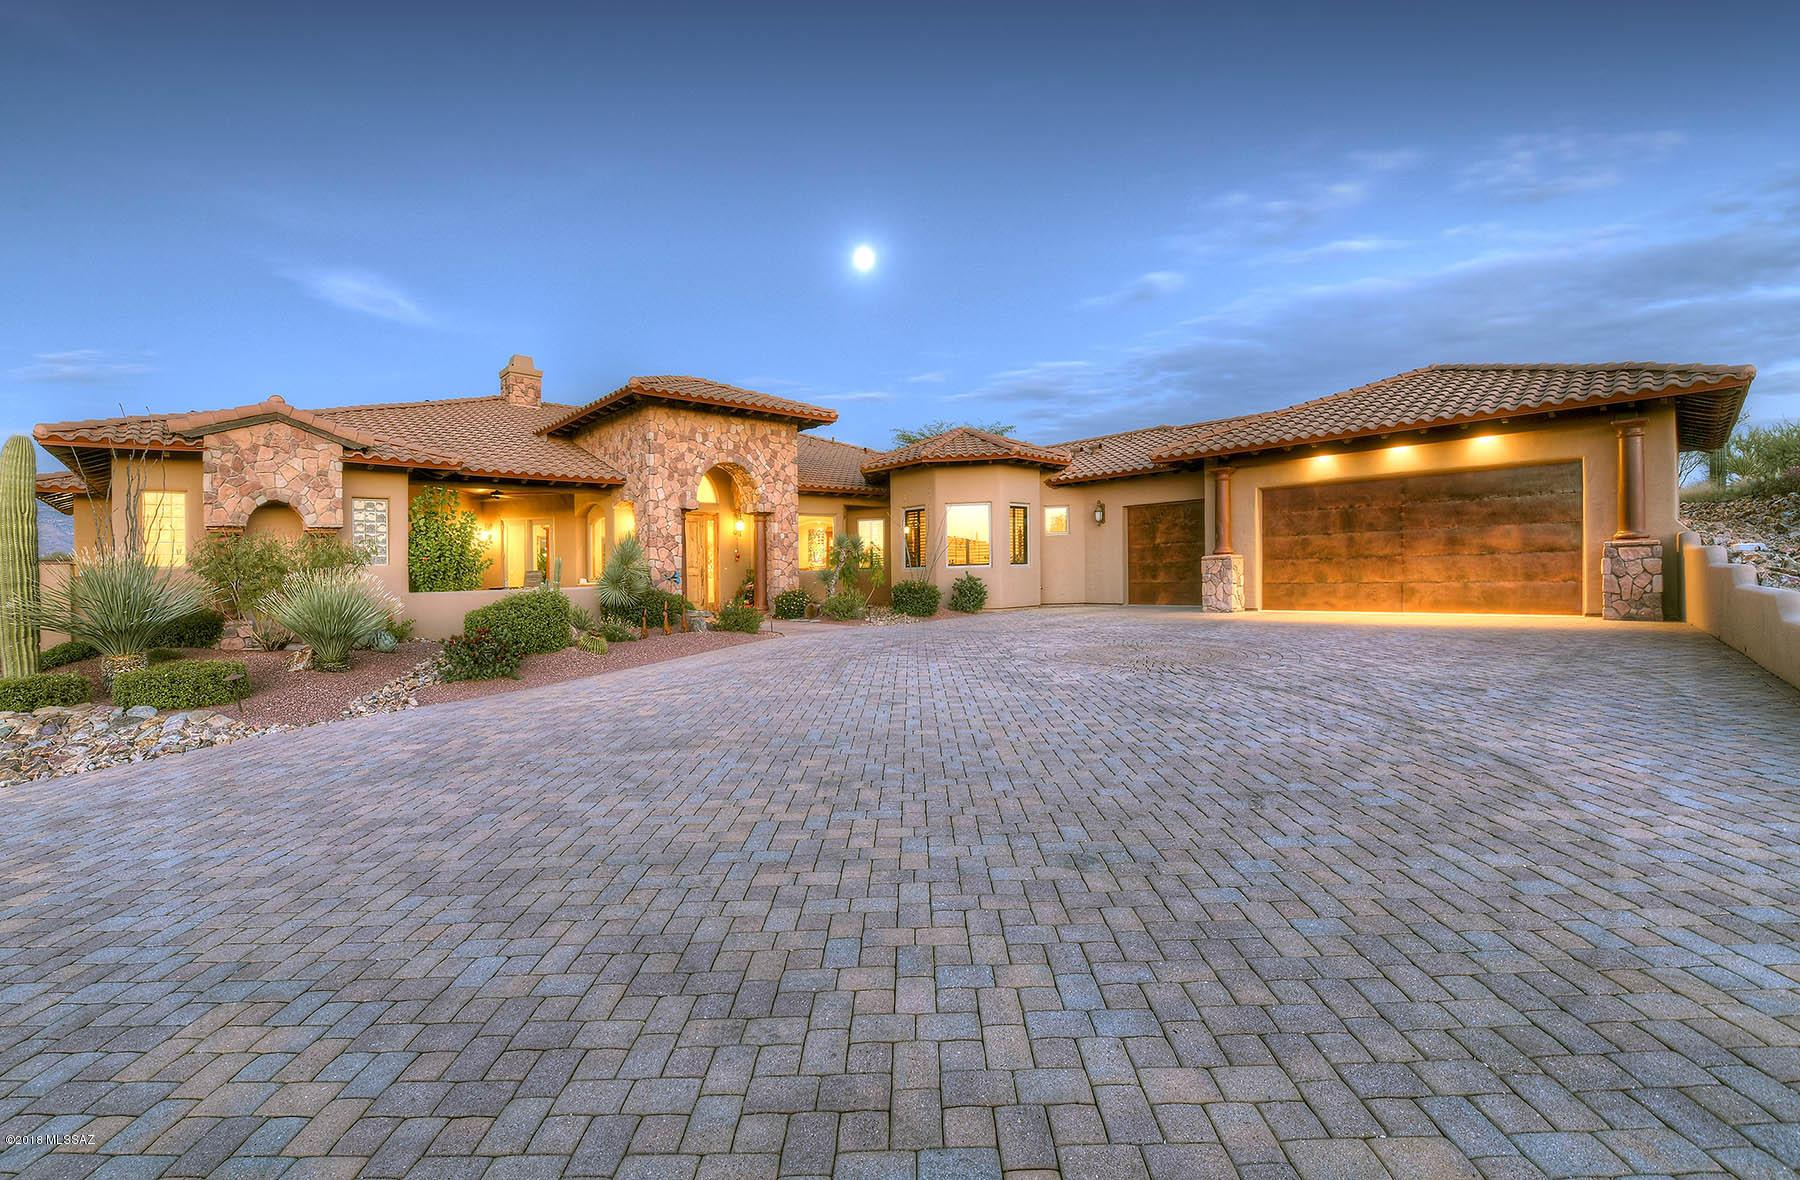 Photo of 15656 E Tumbling Q Ranch Place, Vail, AZ 85641